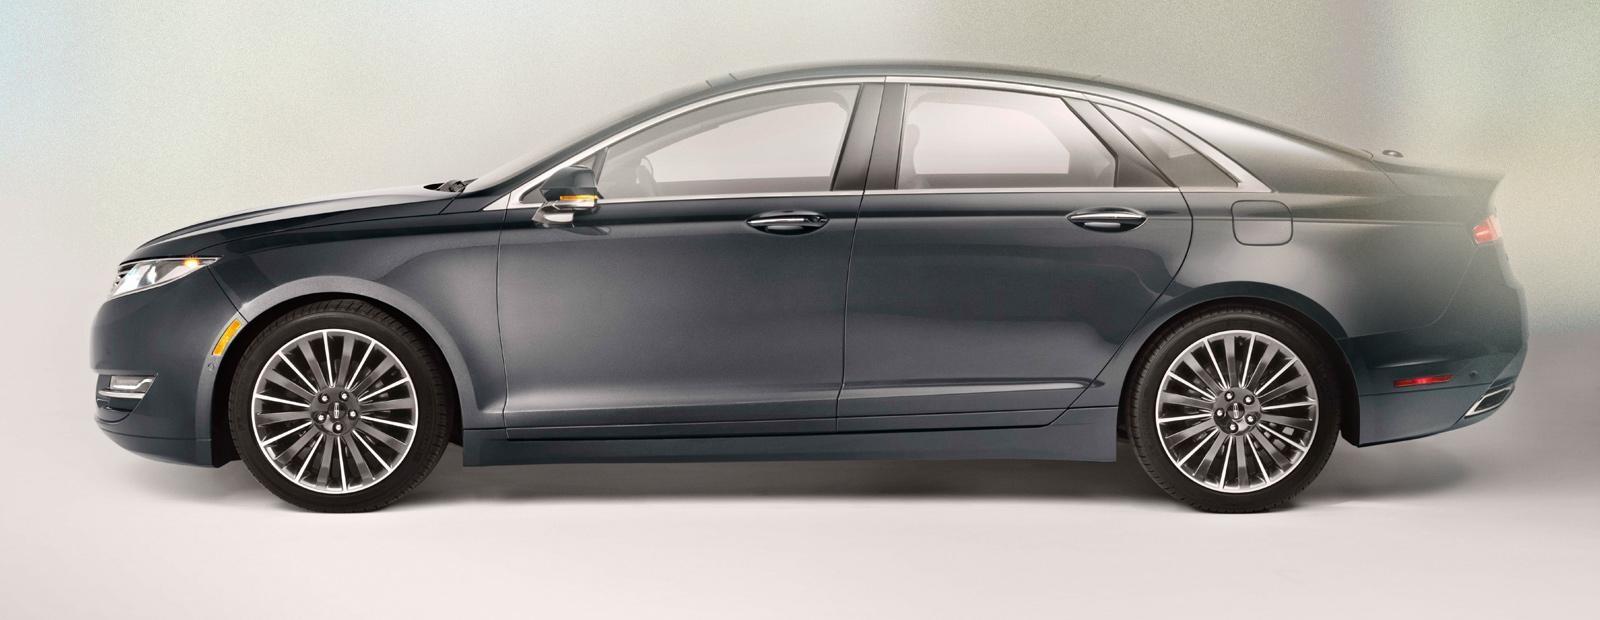 Tom Roush Mazda >> Tom Roush Lincoln Mazda in Westfield, IN 46074 - ChamberofCommerce.com